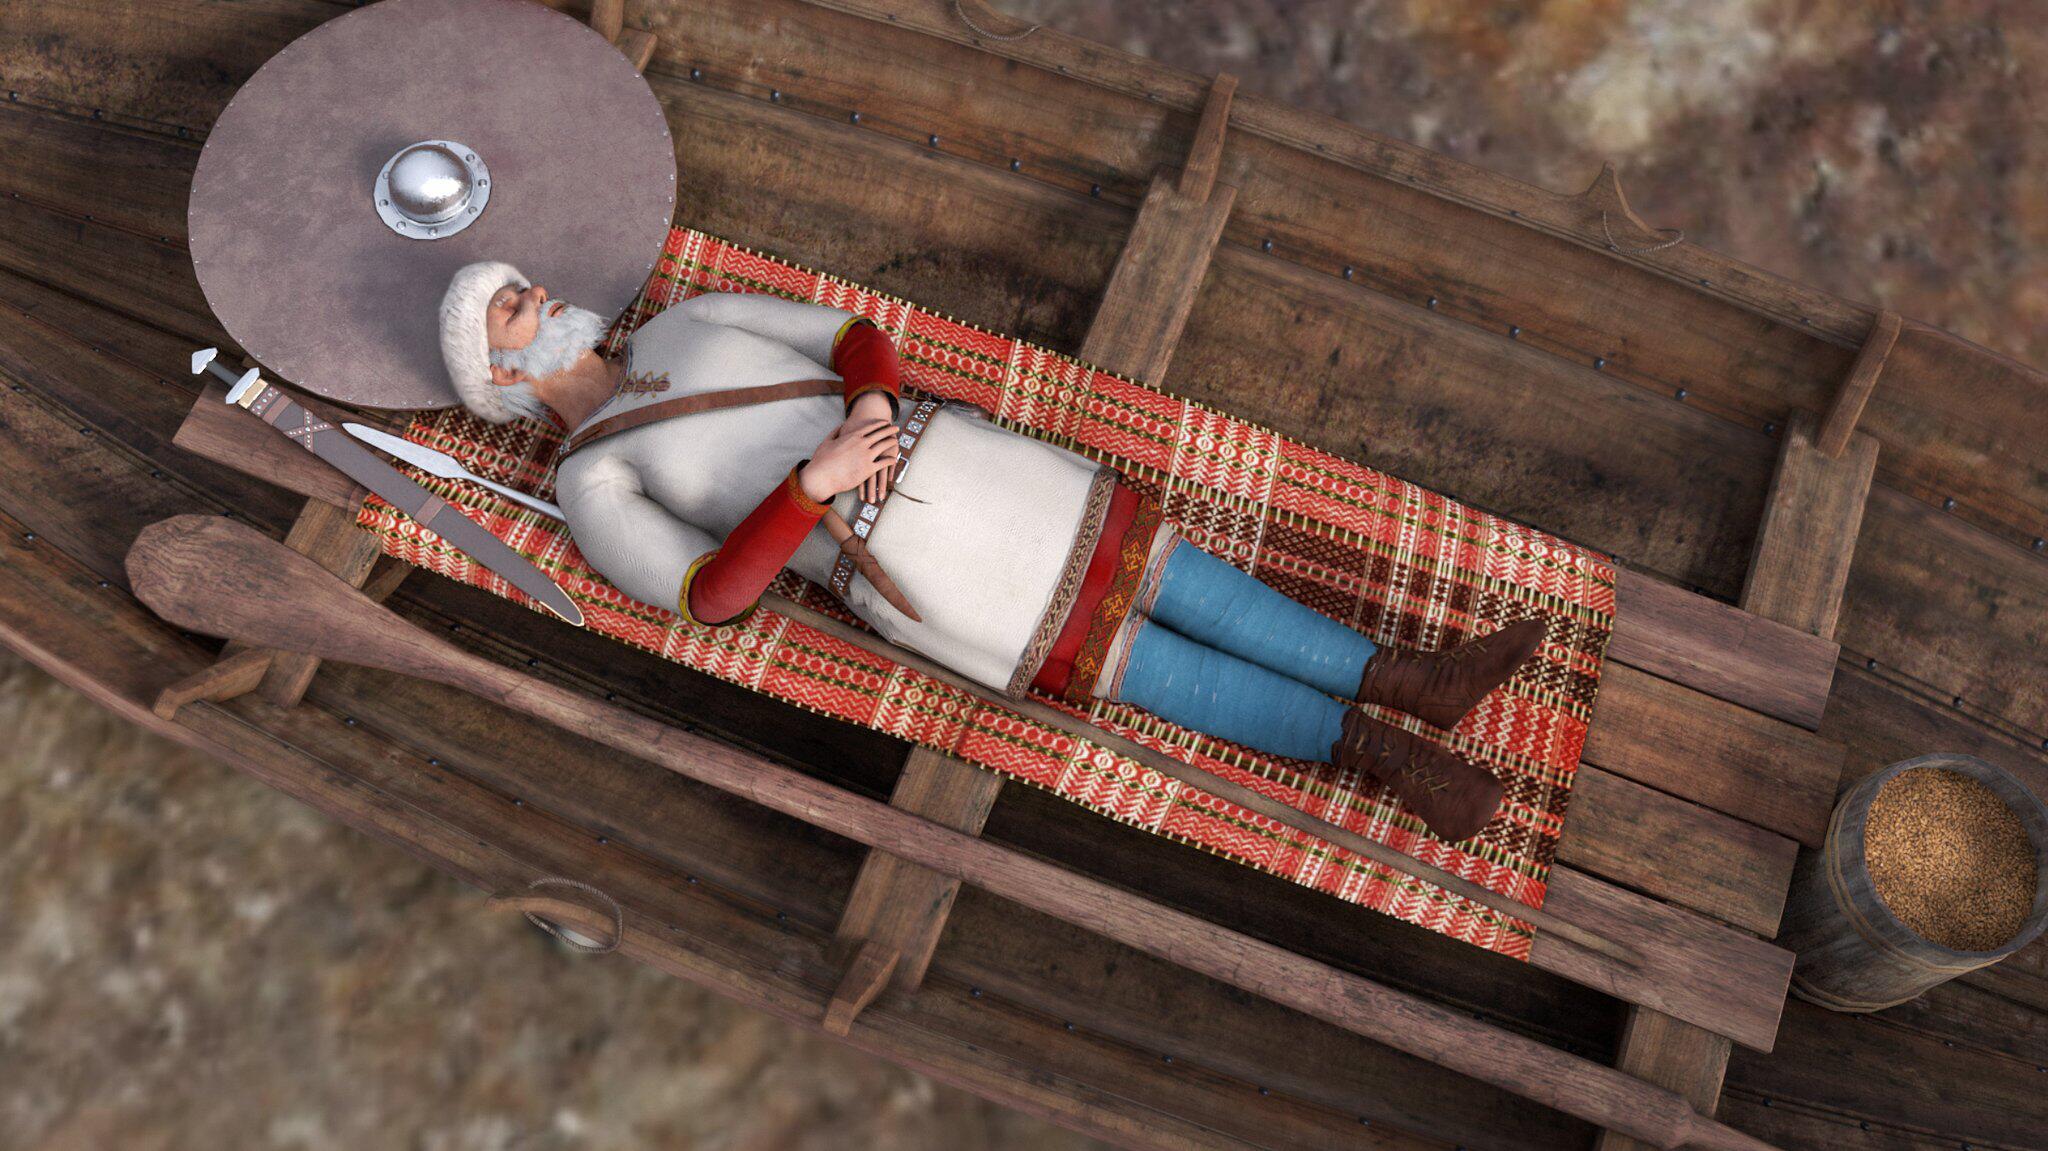 Bild zu Norwegen, Wikinger, Beerdigung, Grab, Bootsgrab, Mythos, Ritus, Ausgrabung, Forscher